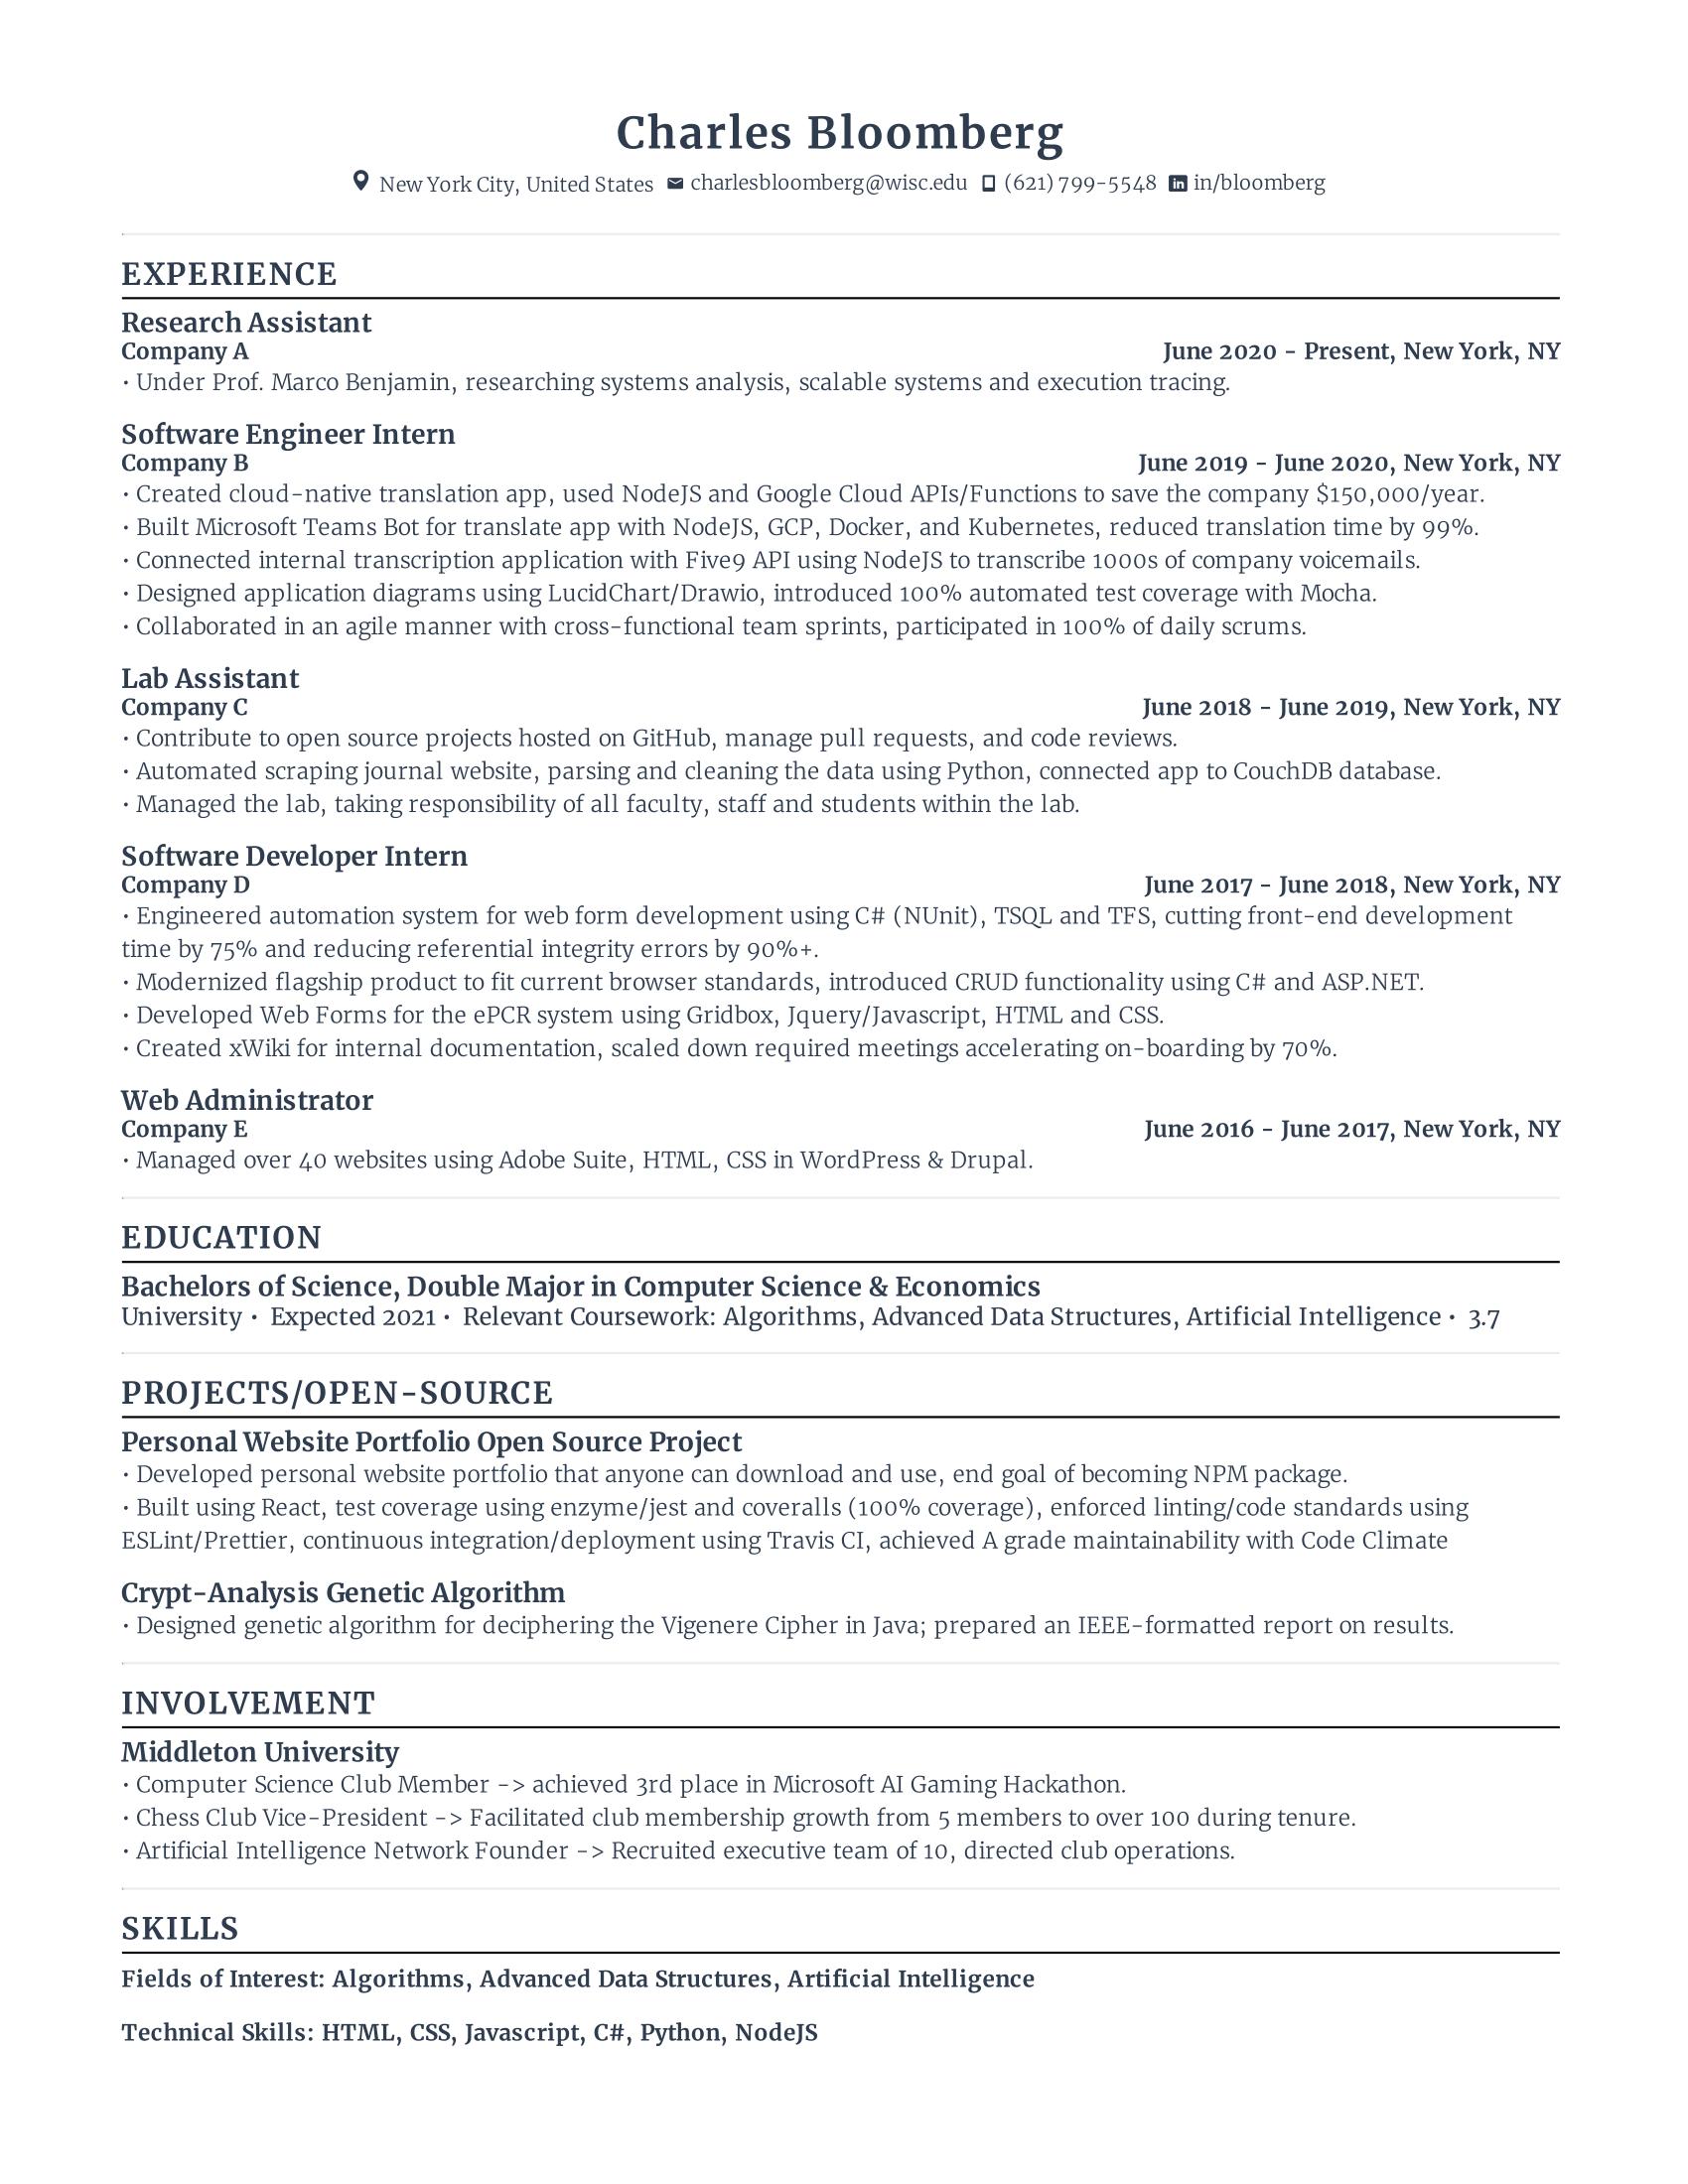 software engineer intern